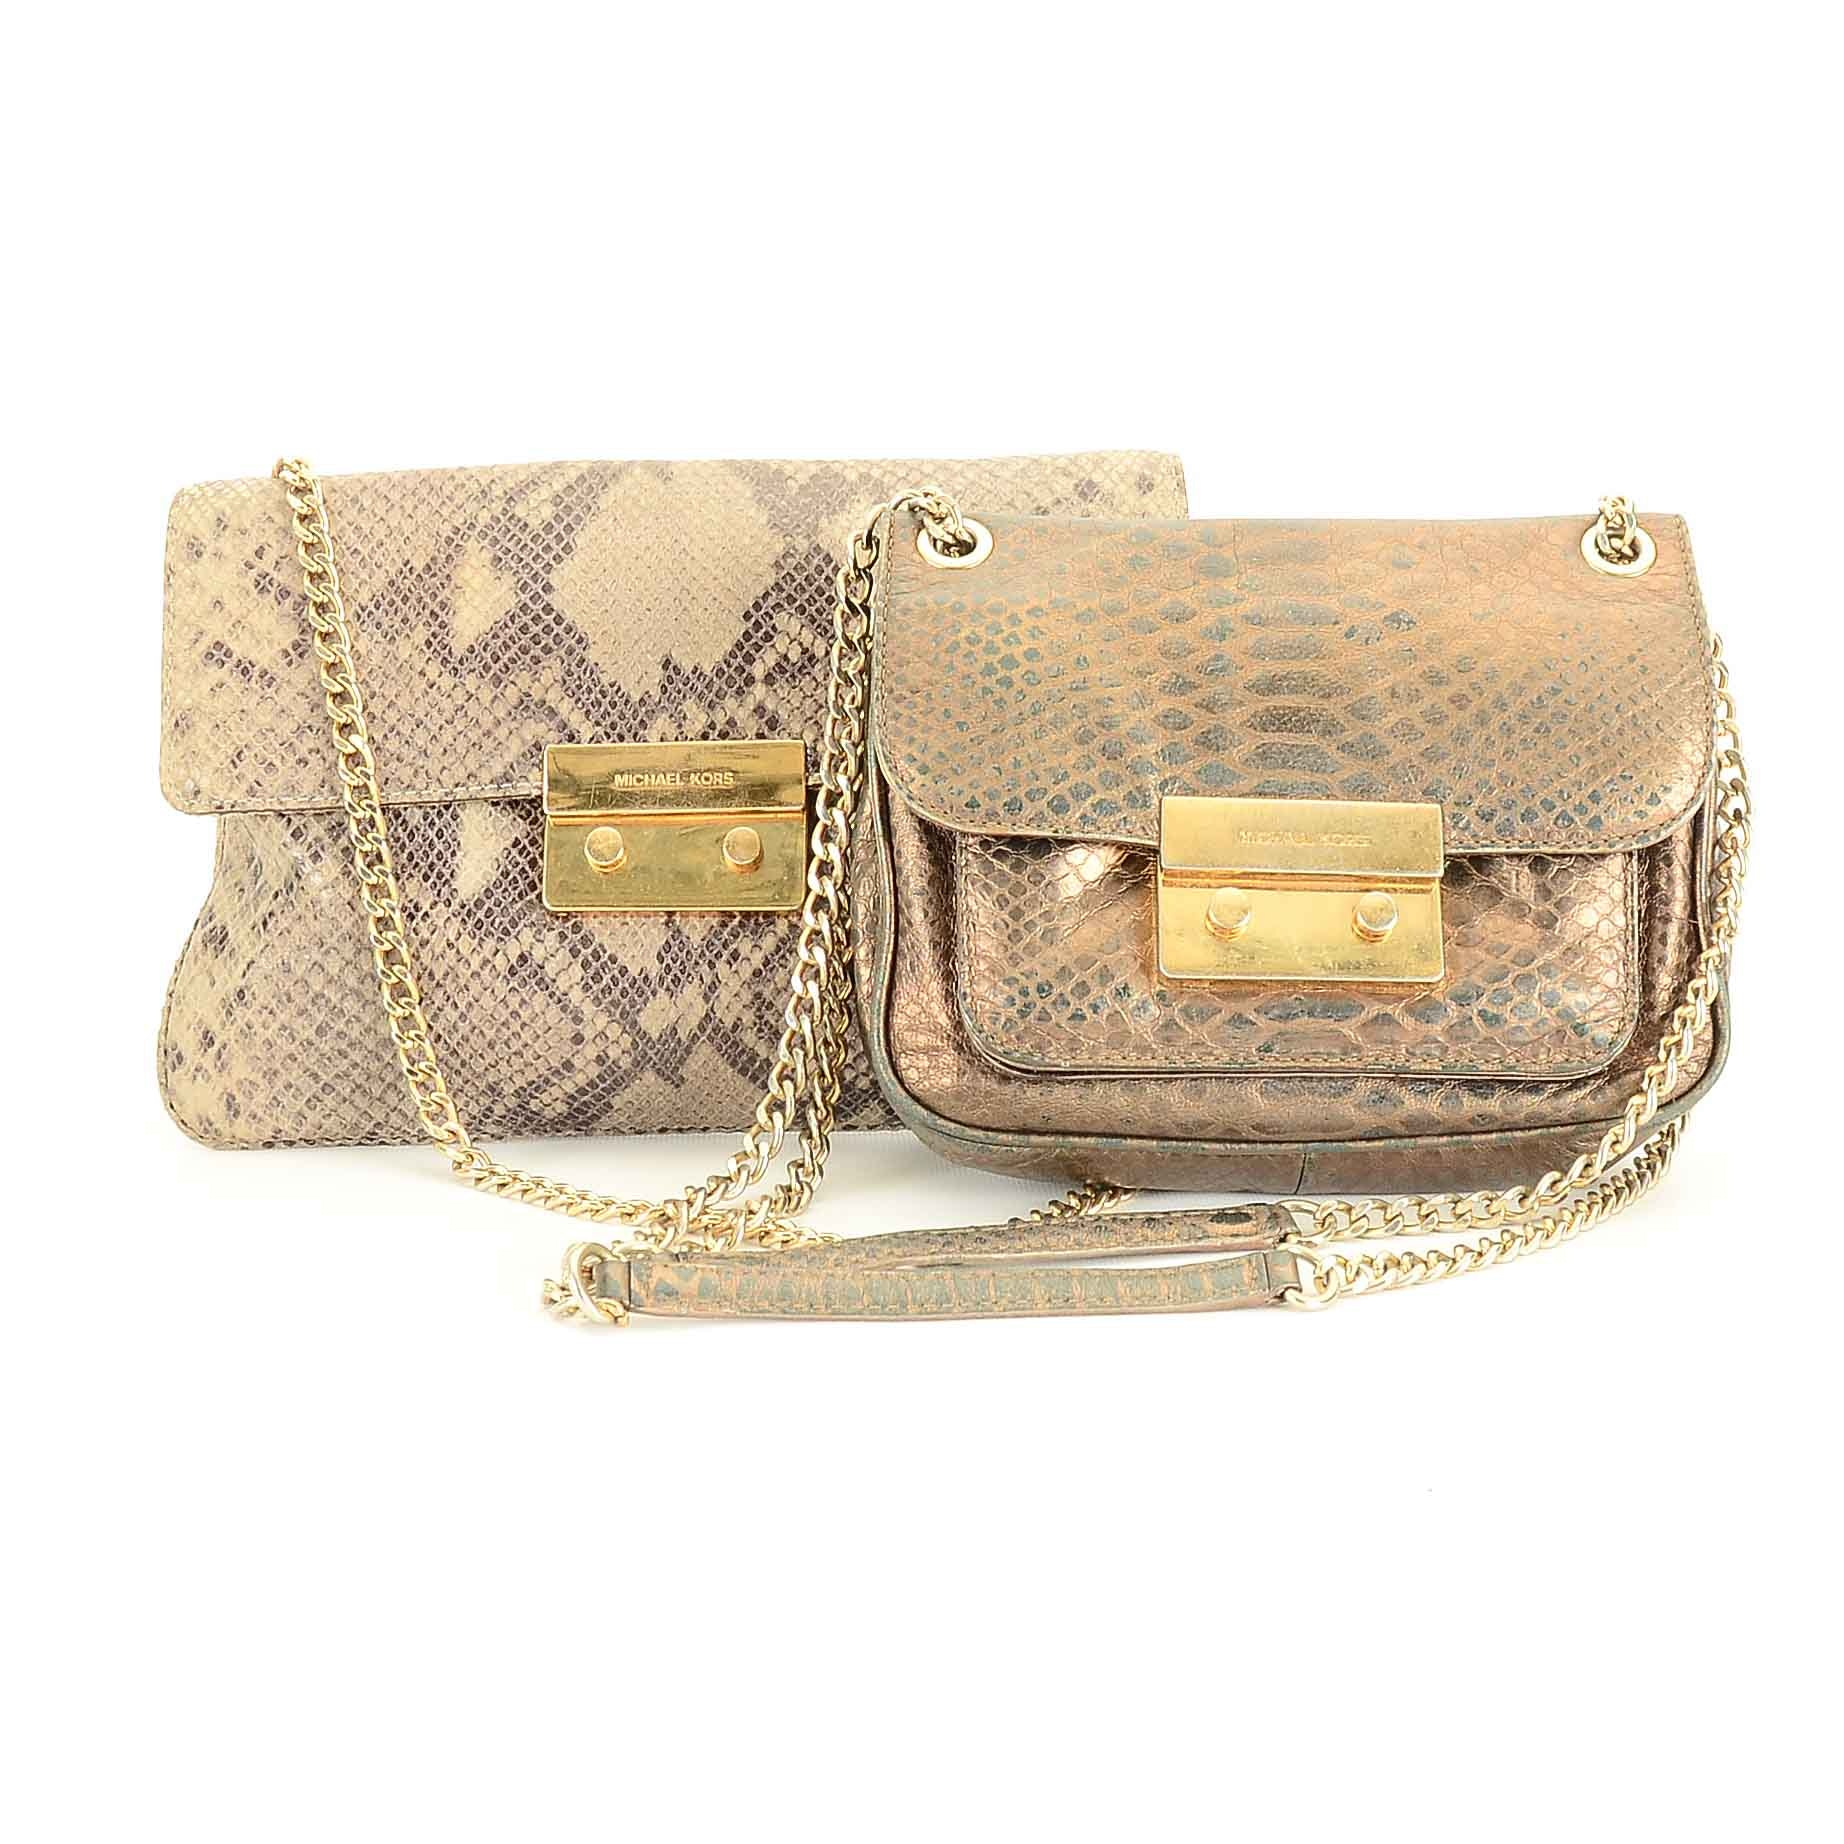 Michael Kors Snakeskin Embossed Leather Handbags